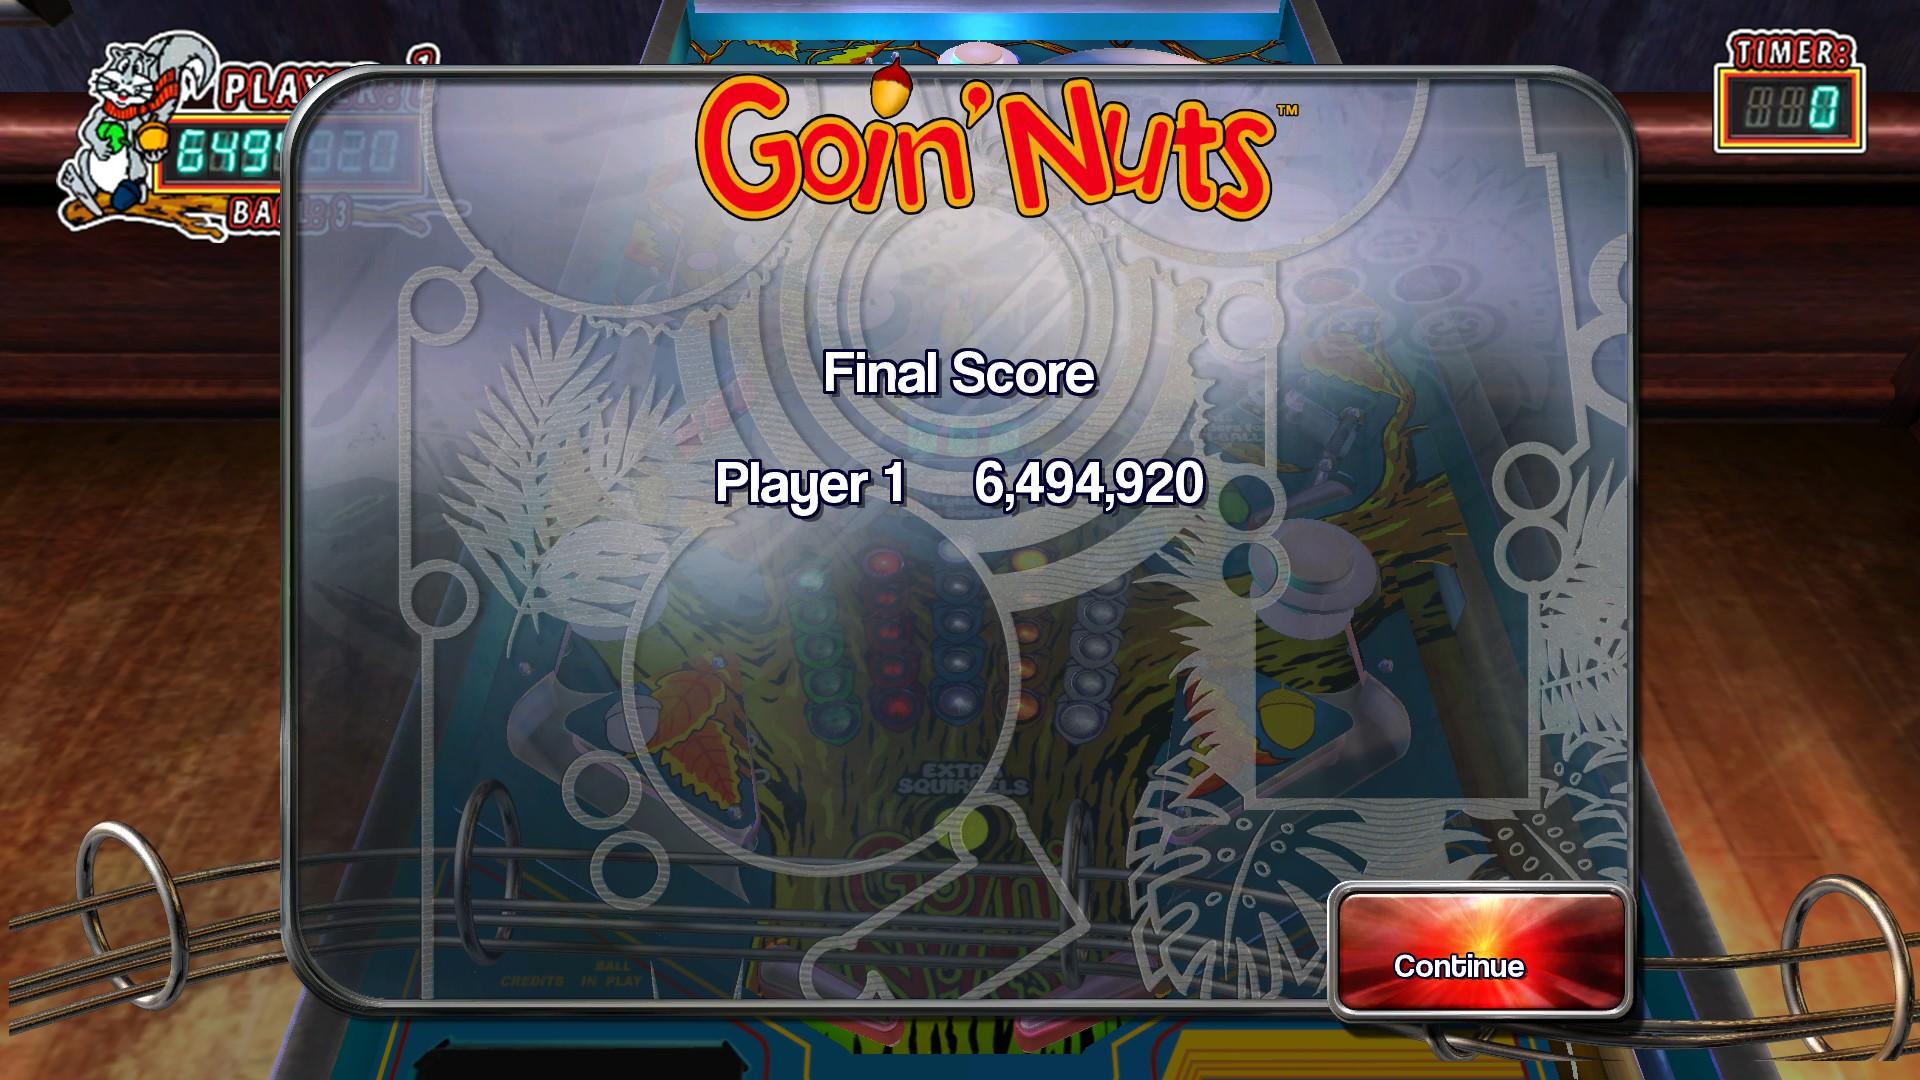 Pinball Arcade: Goin